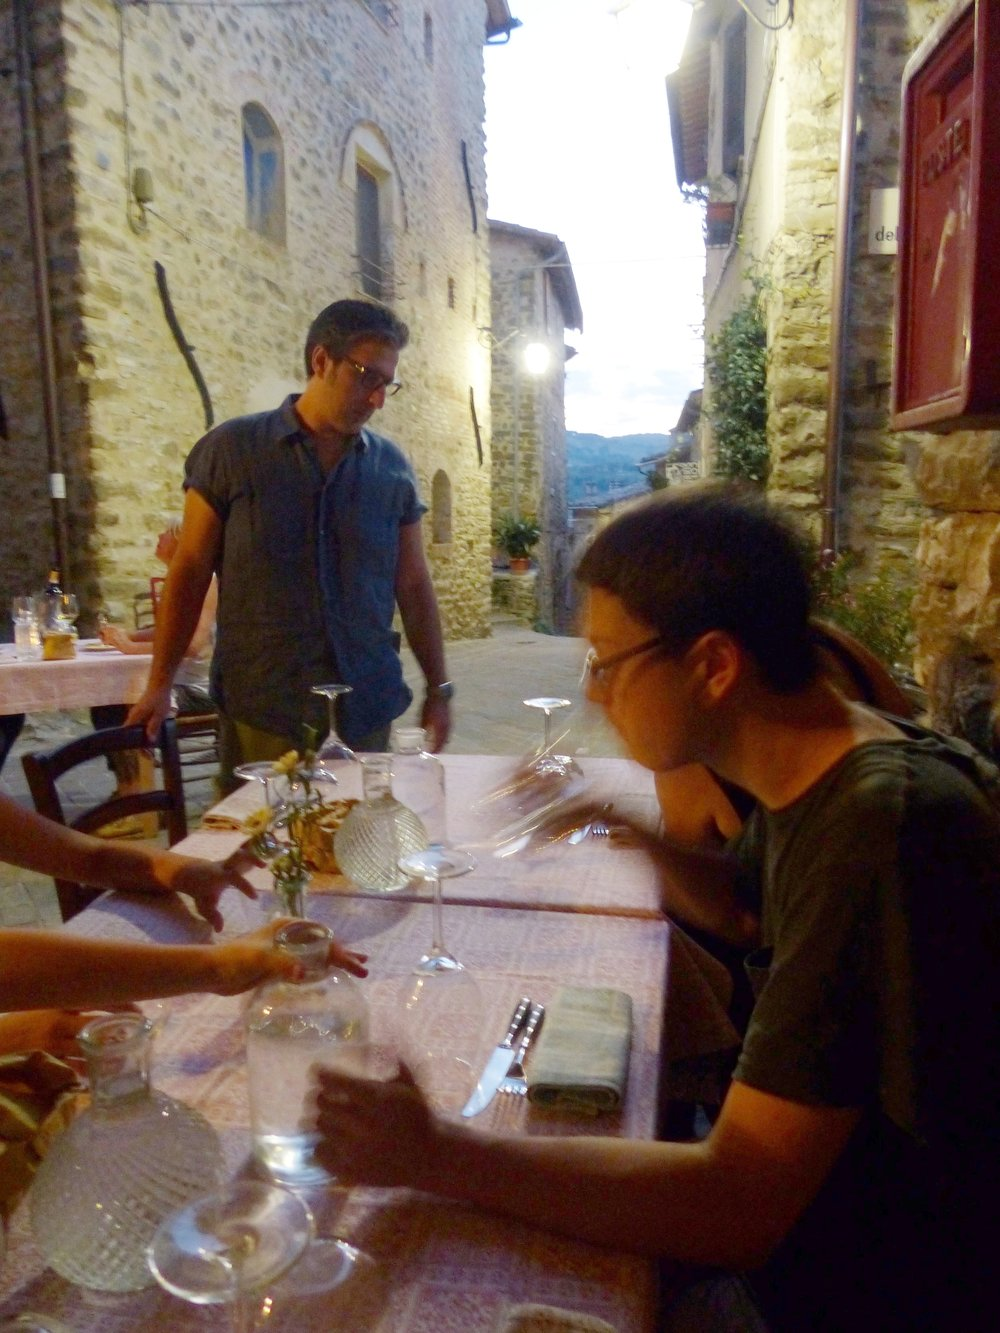 Dining outside Serpillo, Bevagna, umbria